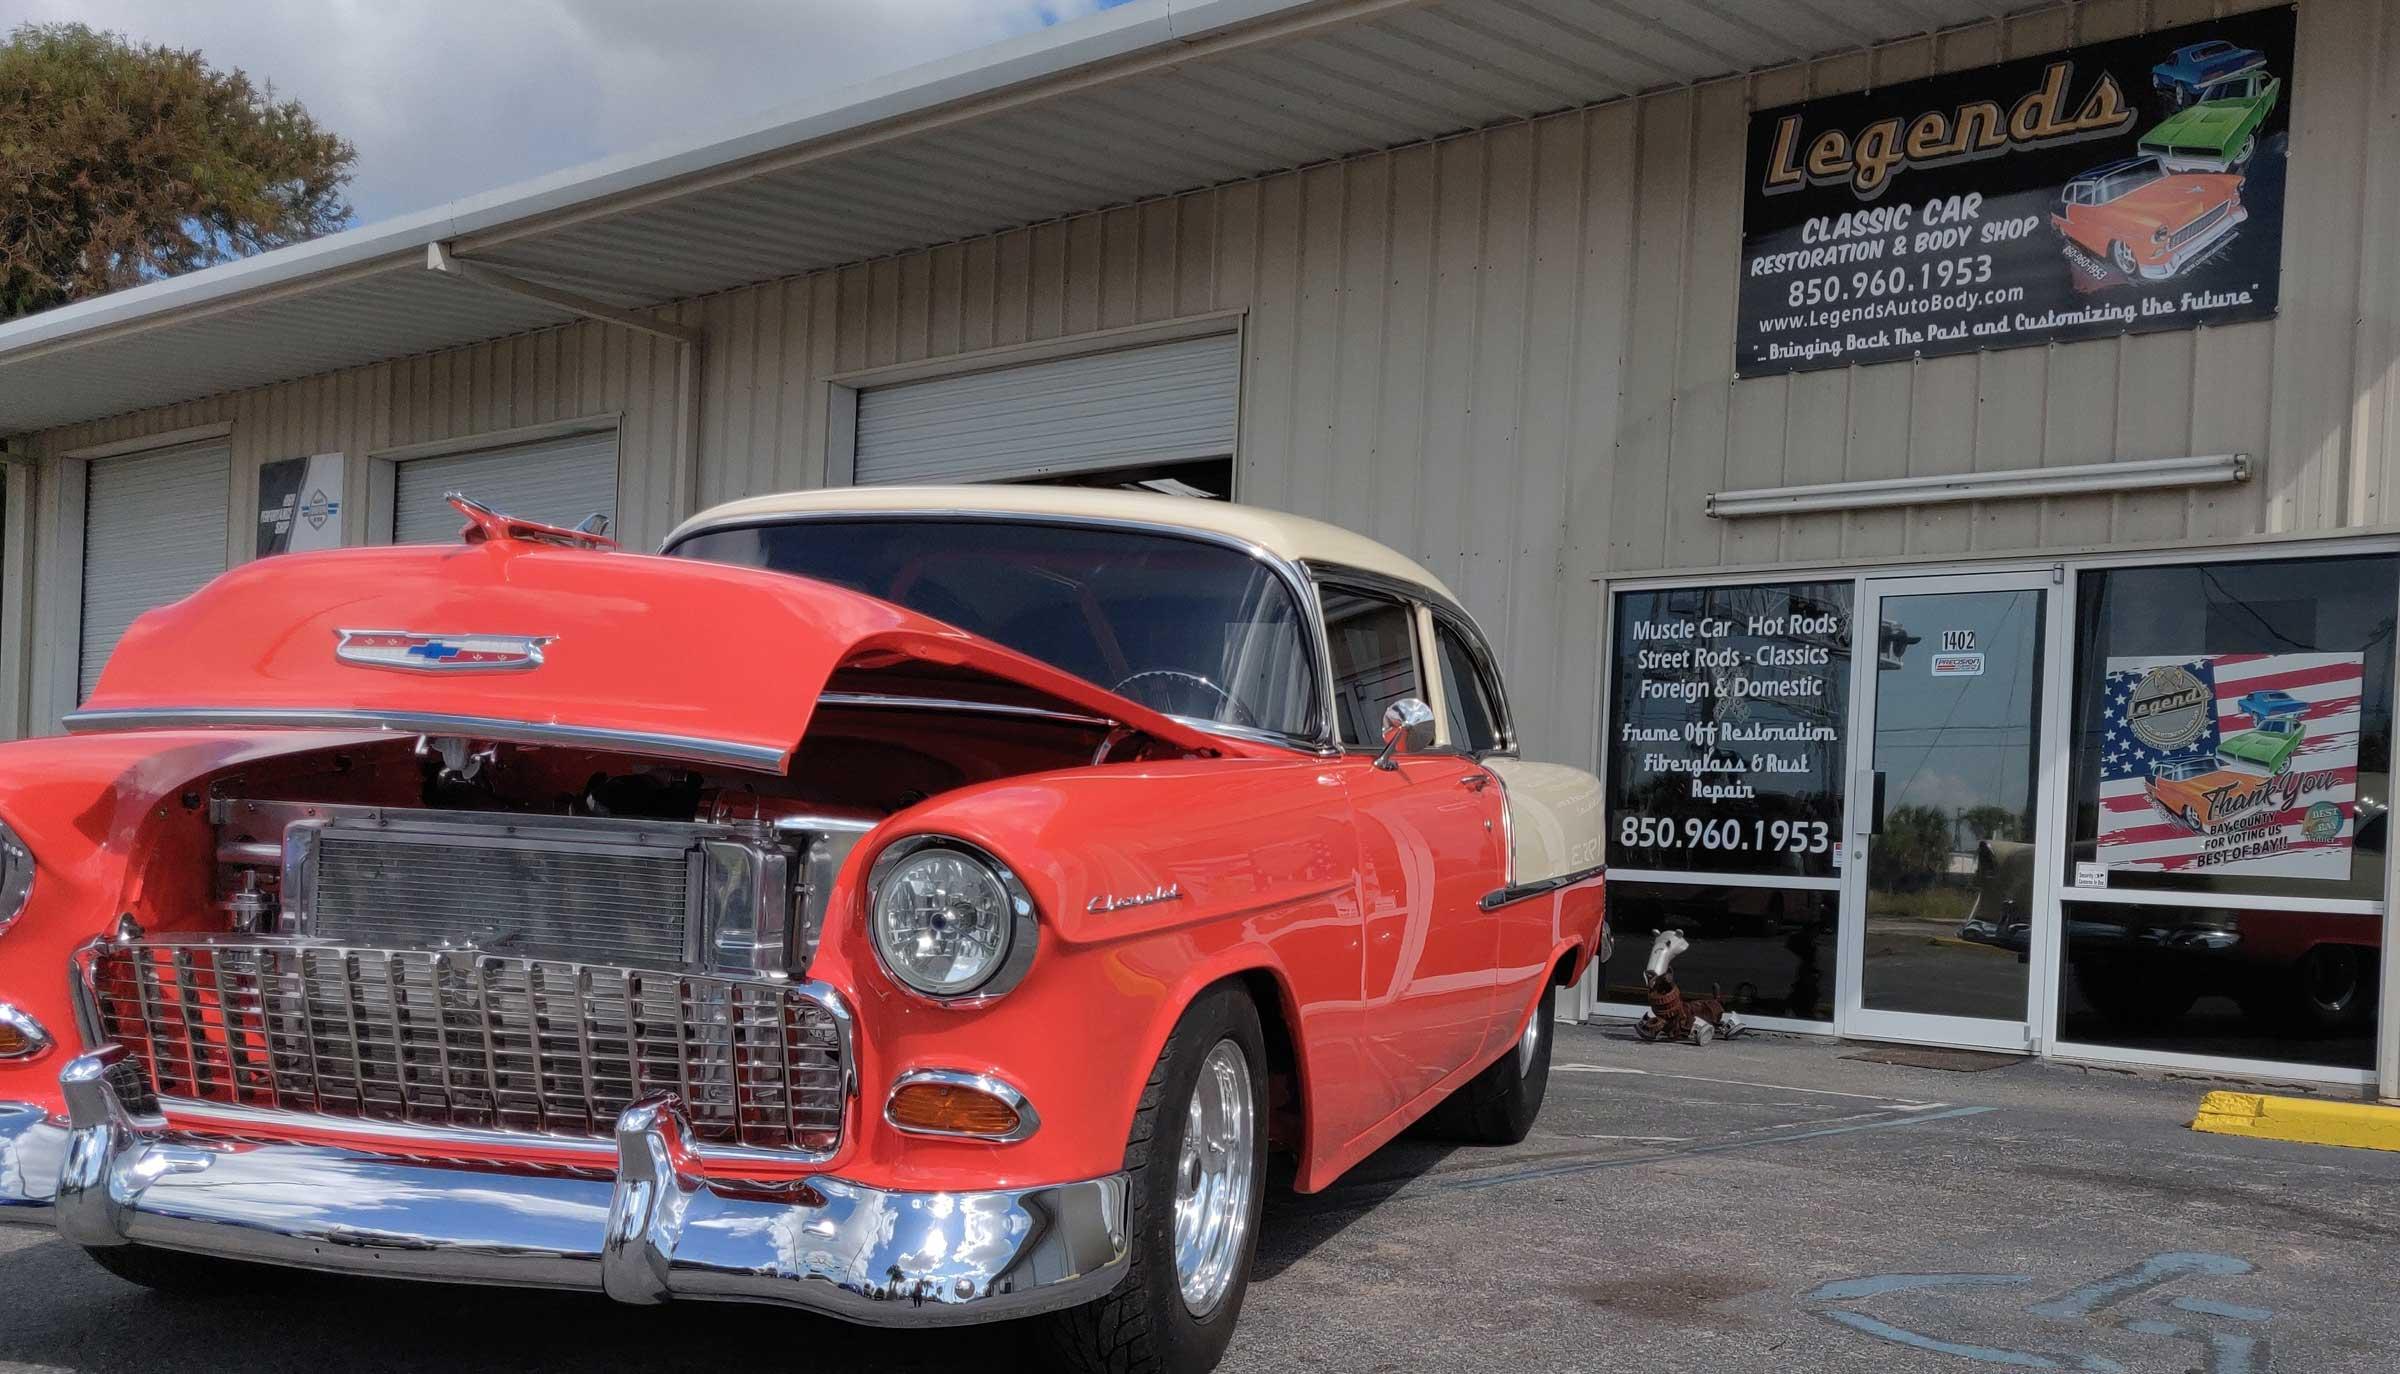 Classic car restoration in Panama City, FL - 55 Belaire